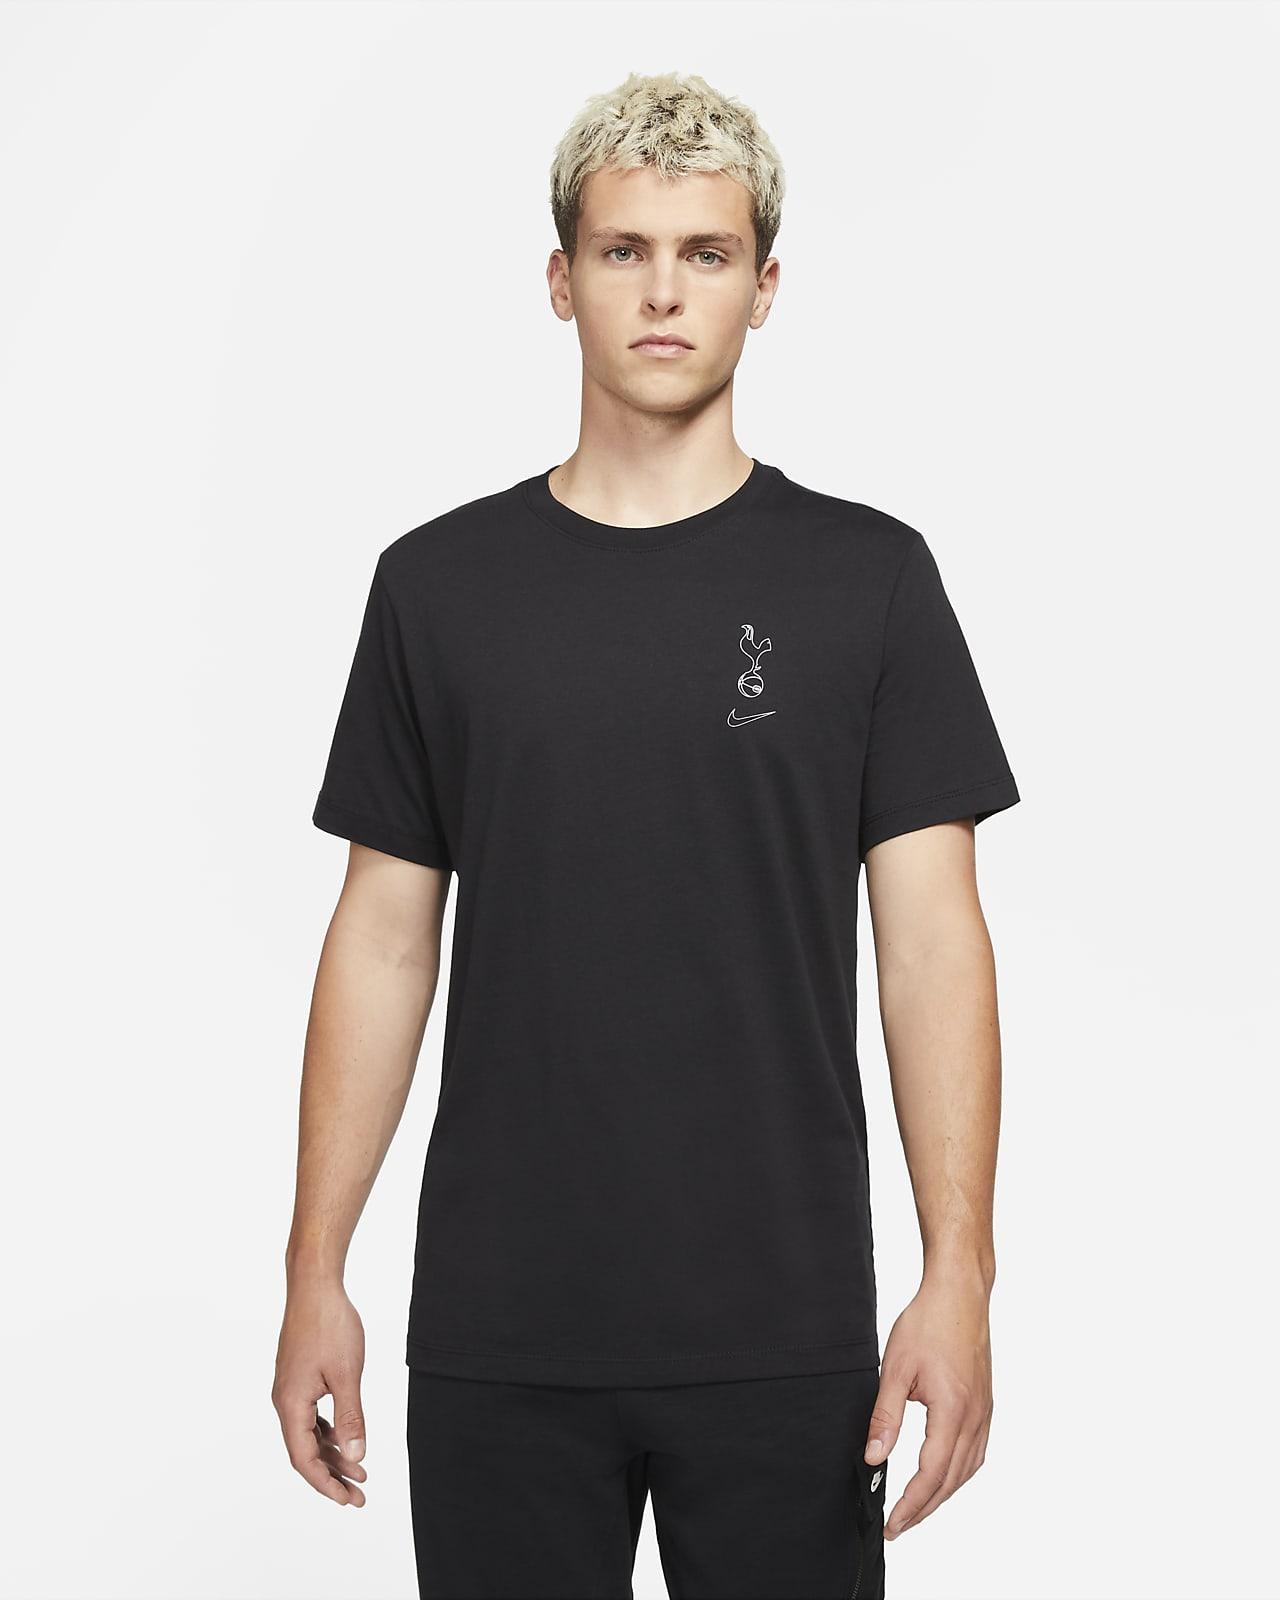 Camiseta de fútbol para hombre Tottenham Hotspur